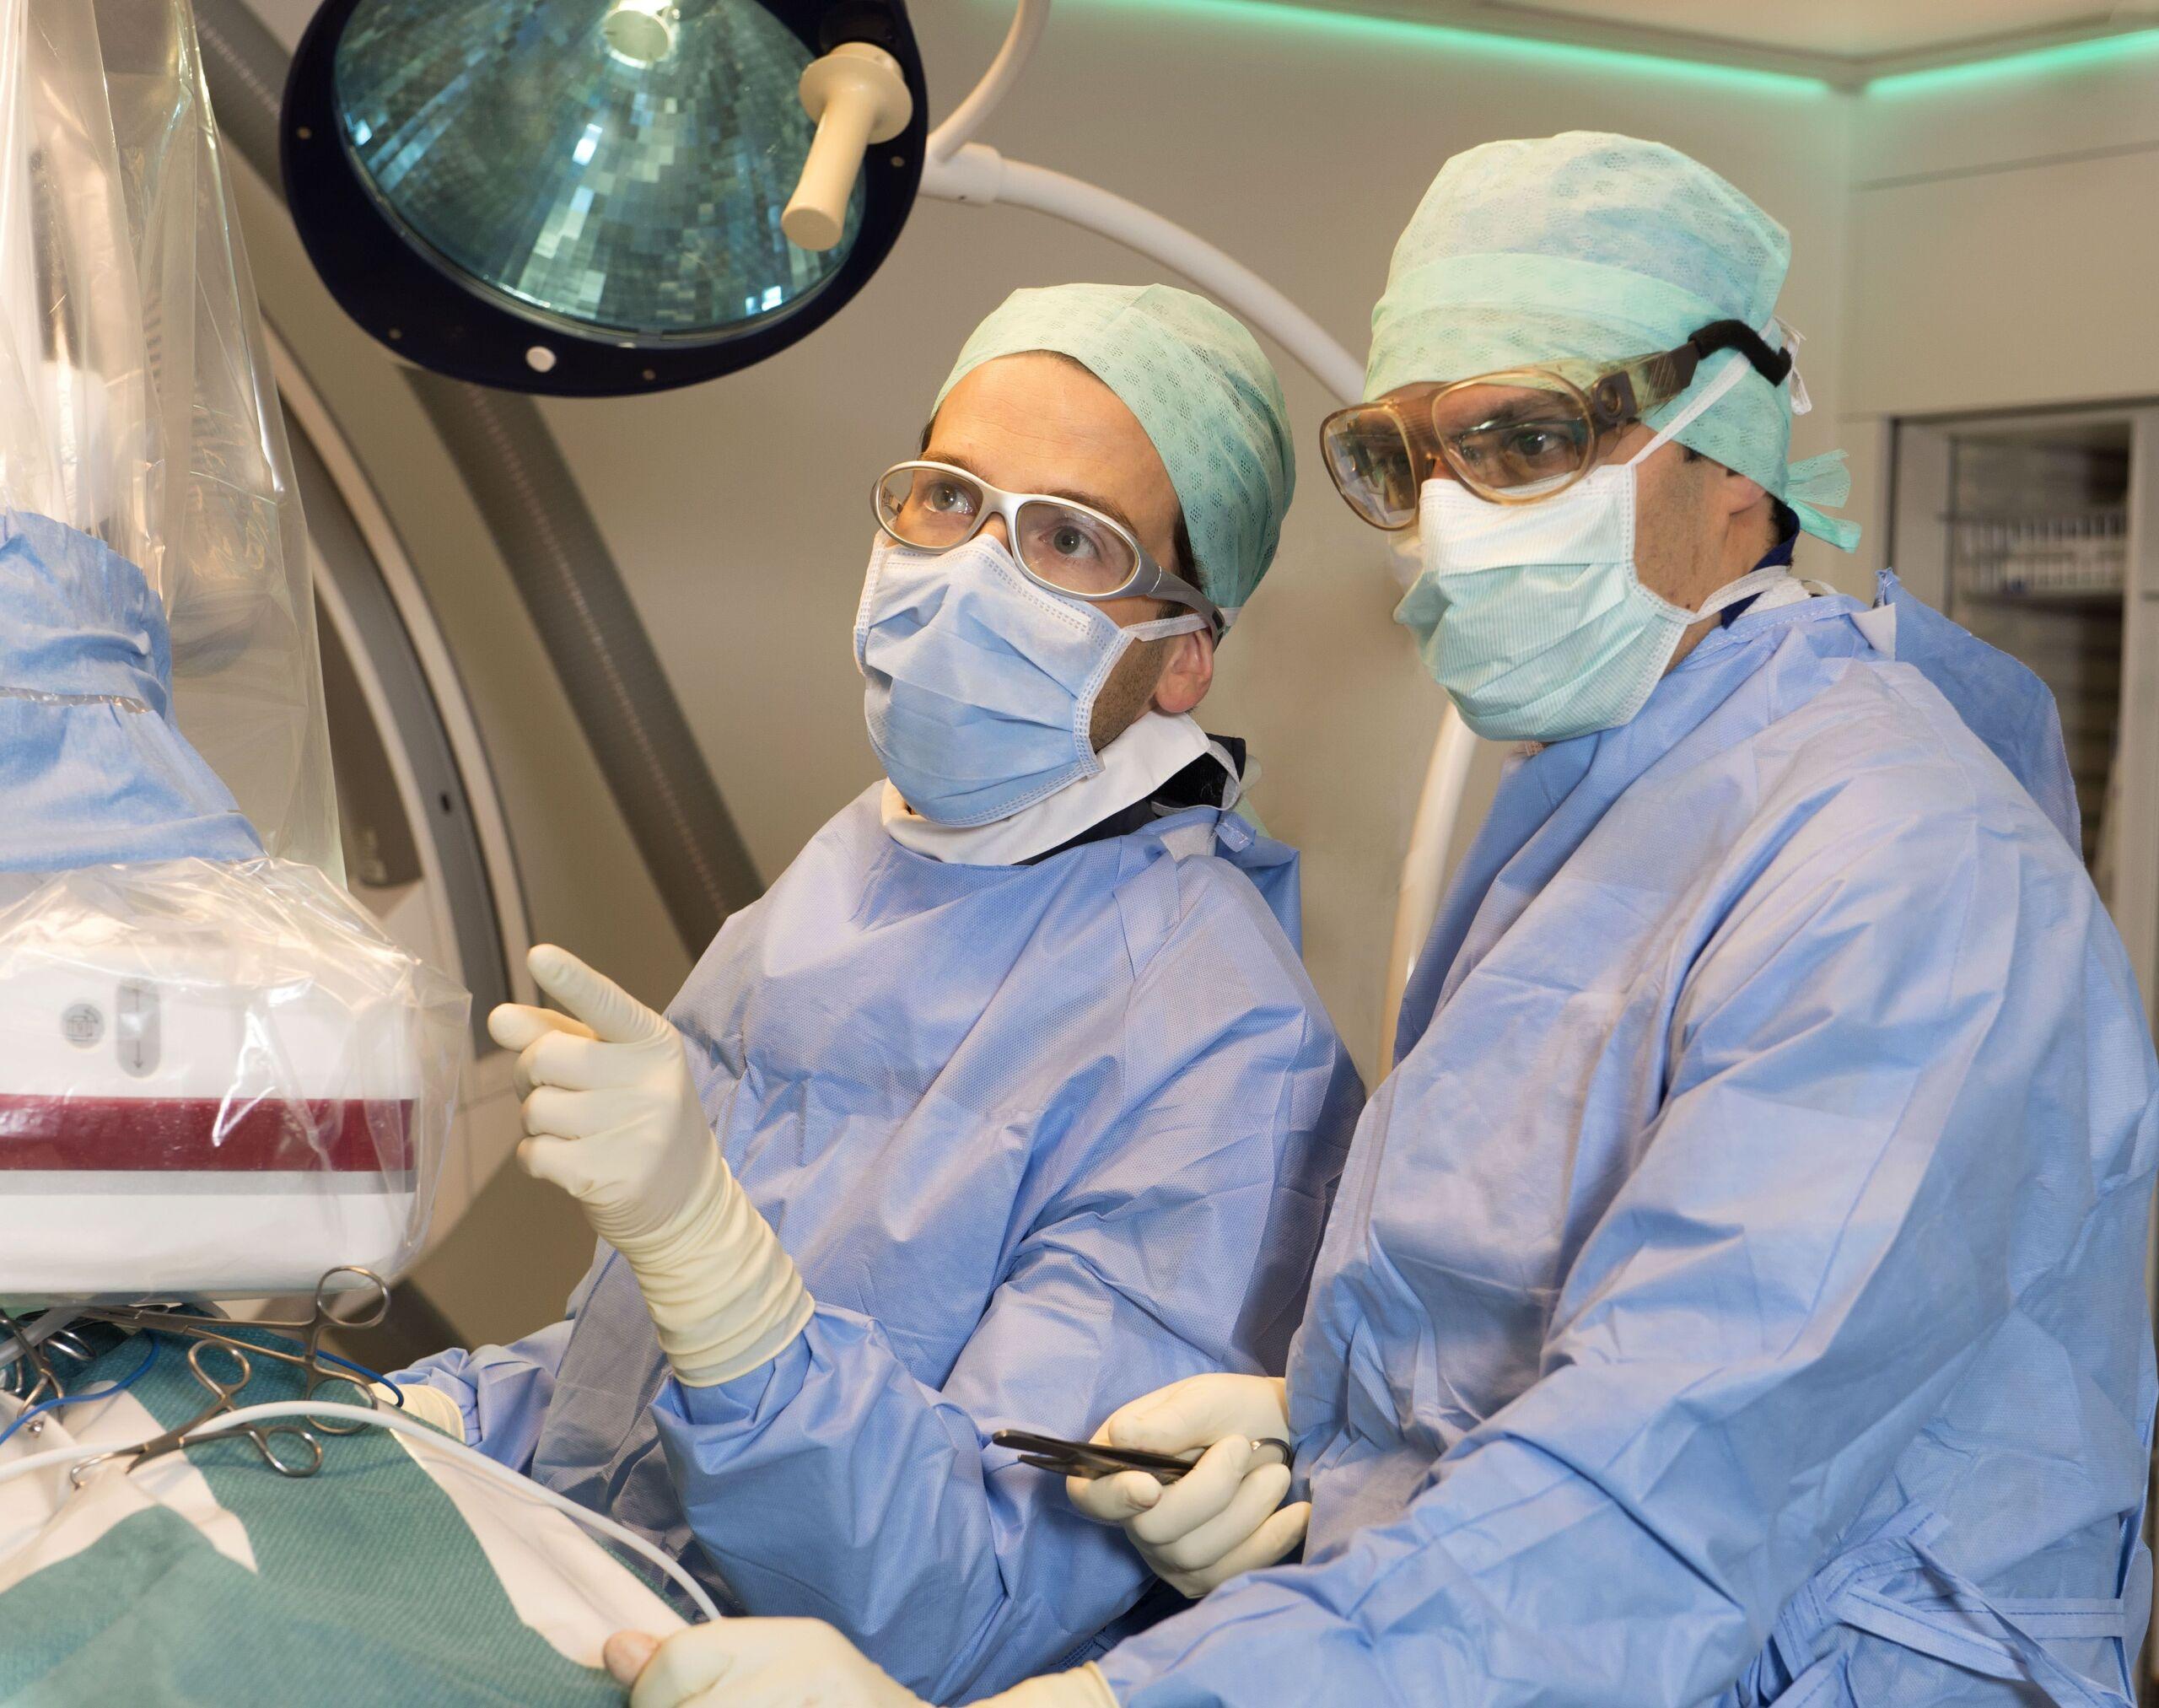 CRT-D Implantation durch PD Dr. Jan Steffel (links) und Dr. Ardan Saguner (rechts)